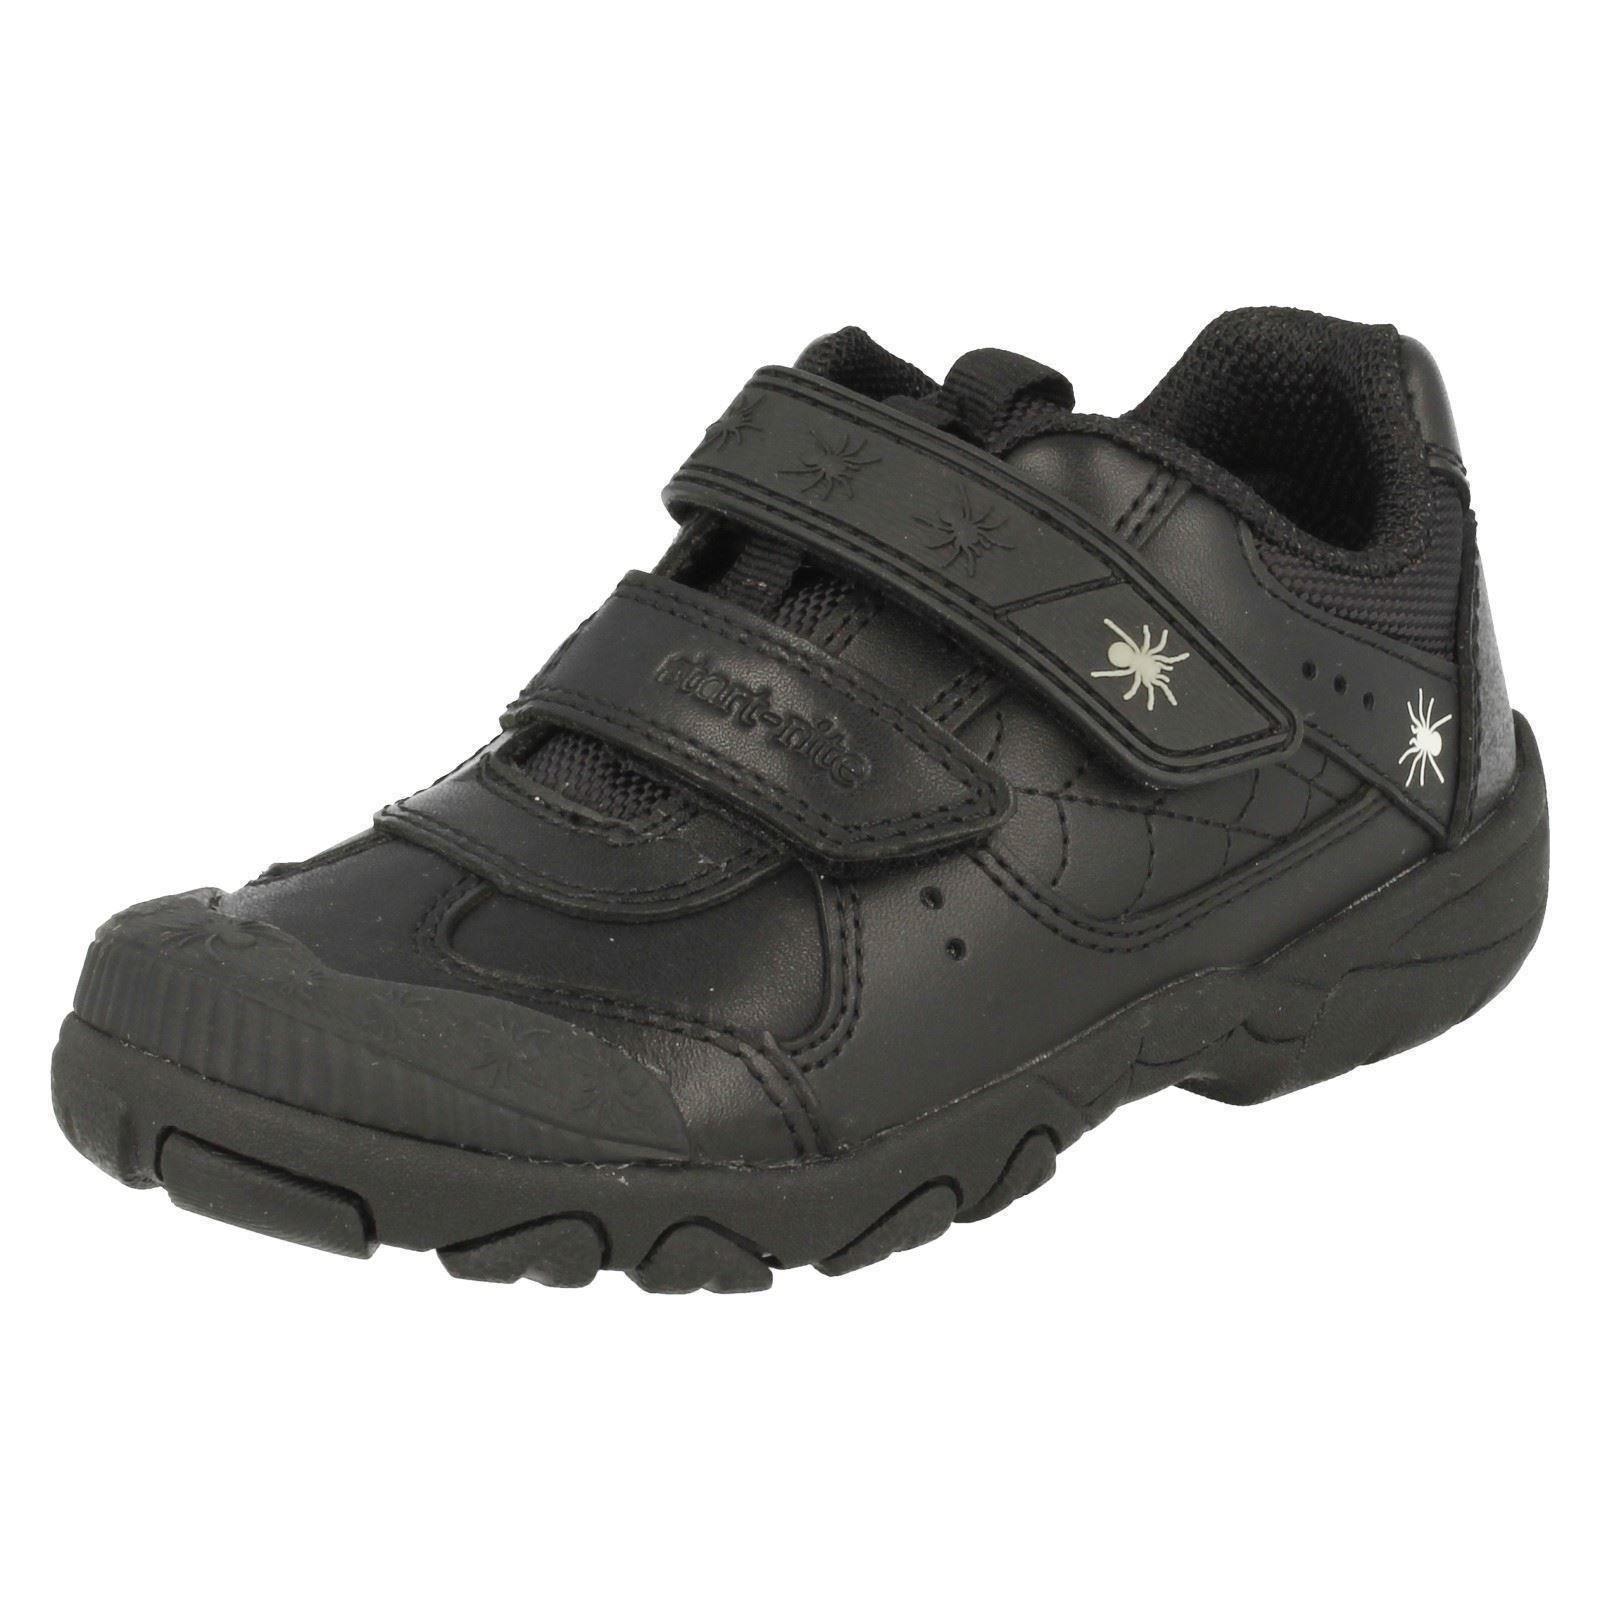 Boys Startrite Formal School Shoes Tarantula